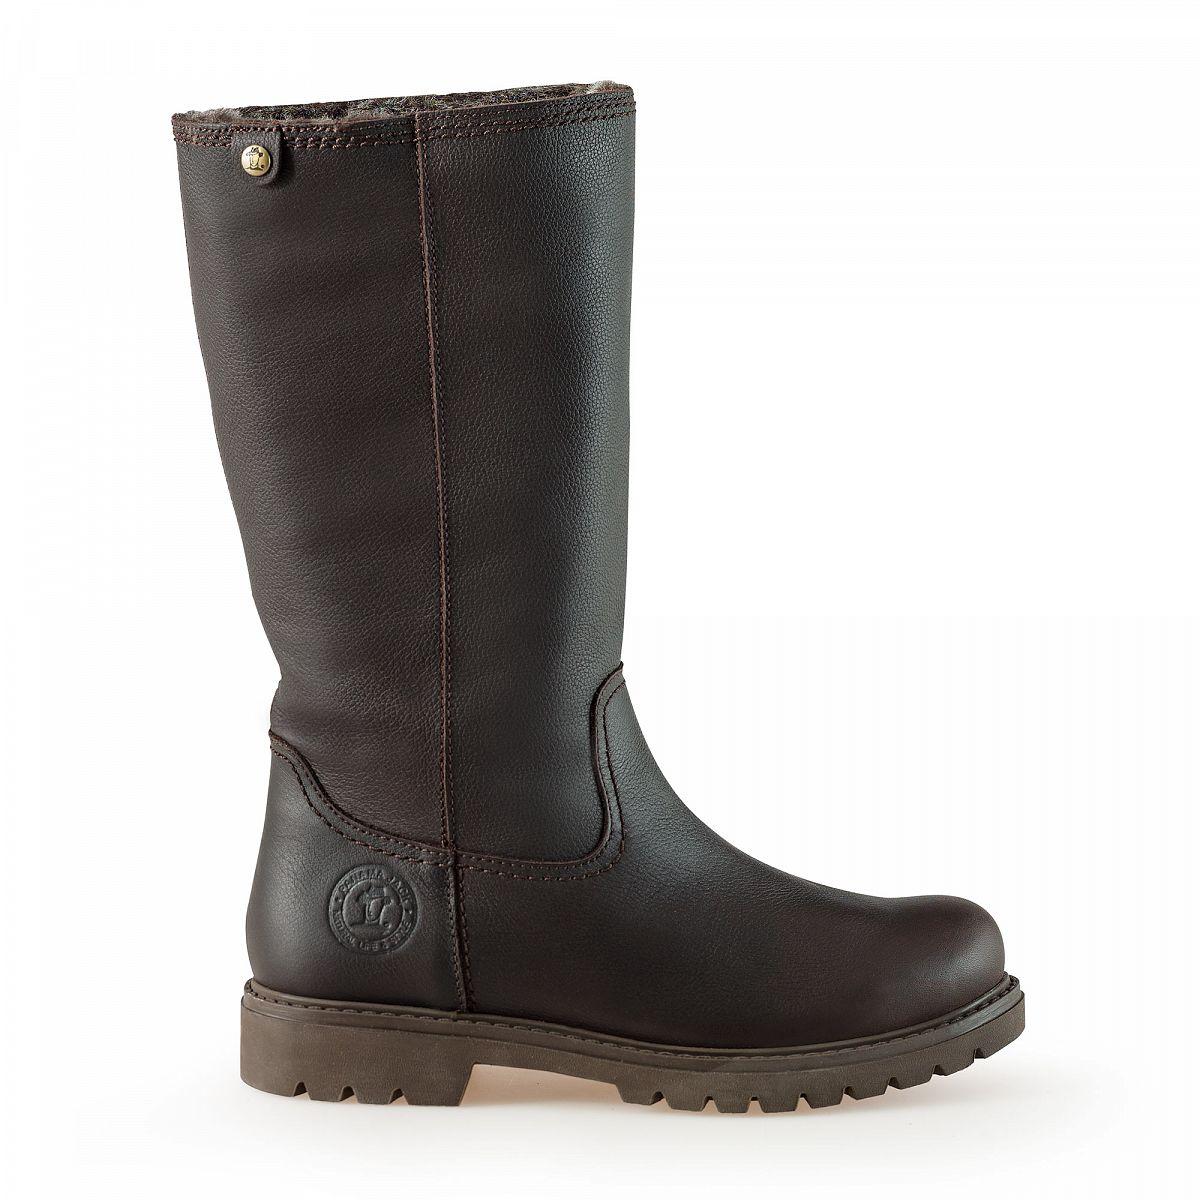 womens boots bambina brown panama jack online shop. Black Bedroom Furniture Sets. Home Design Ideas